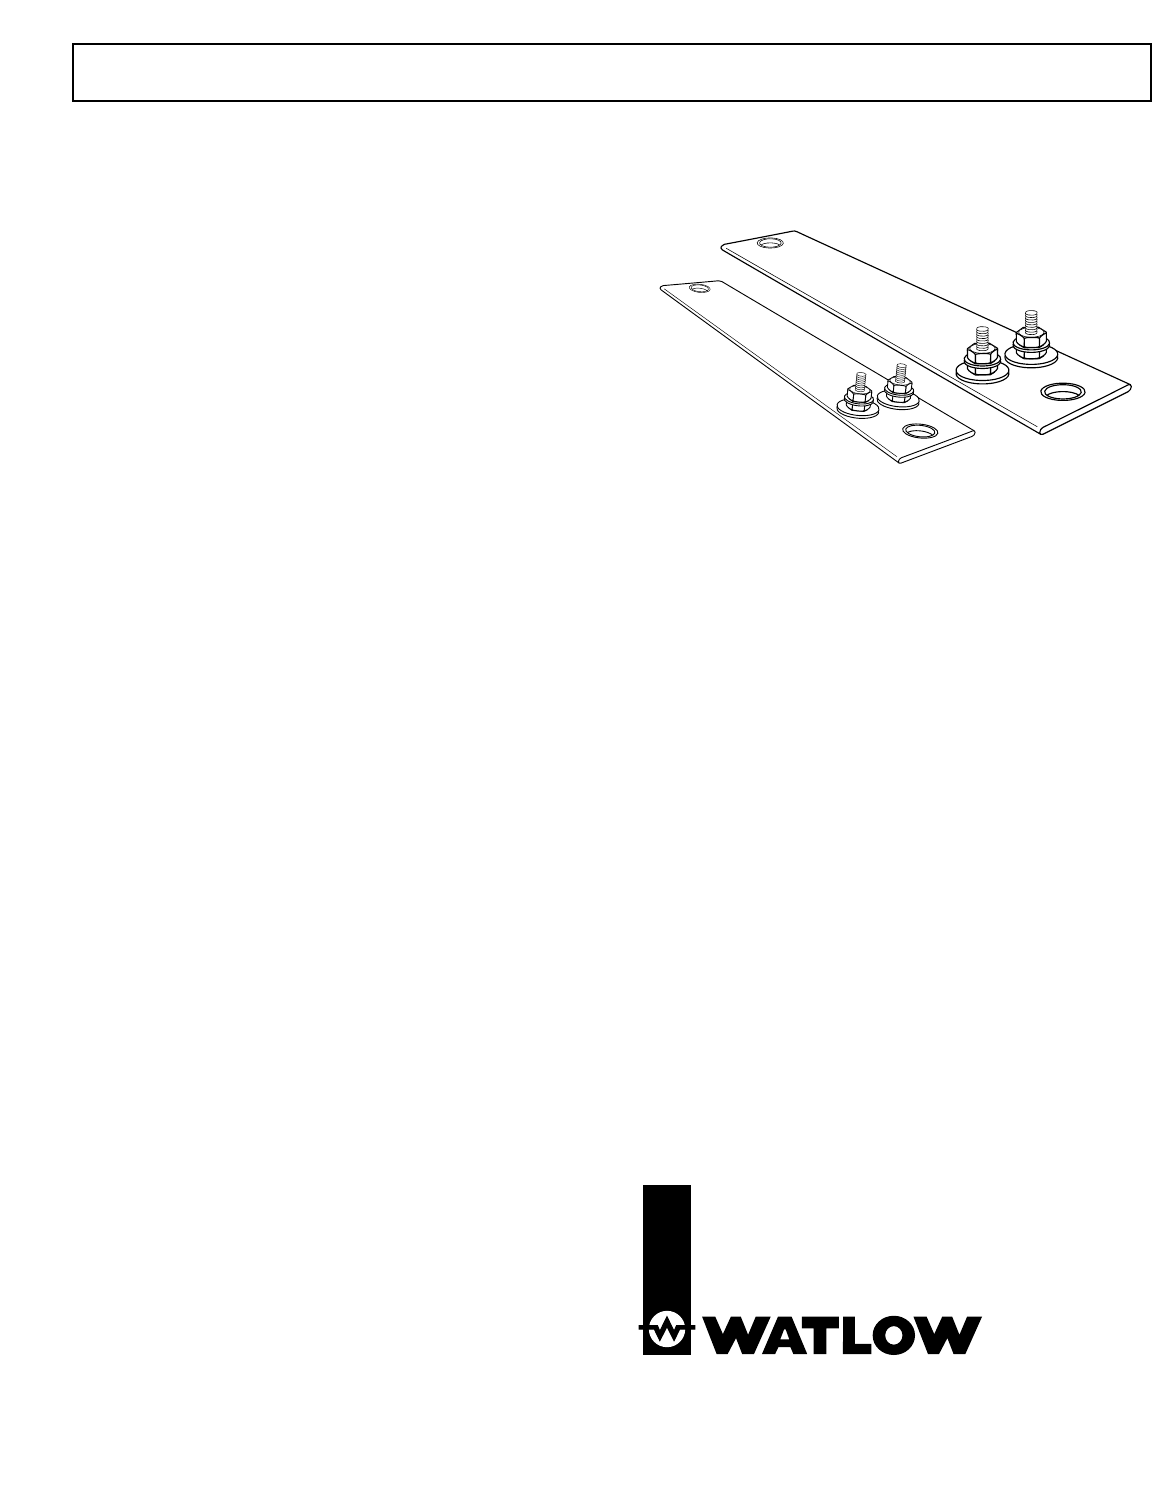 Watlow Heater Wiring Diagram from usermanual.wiki